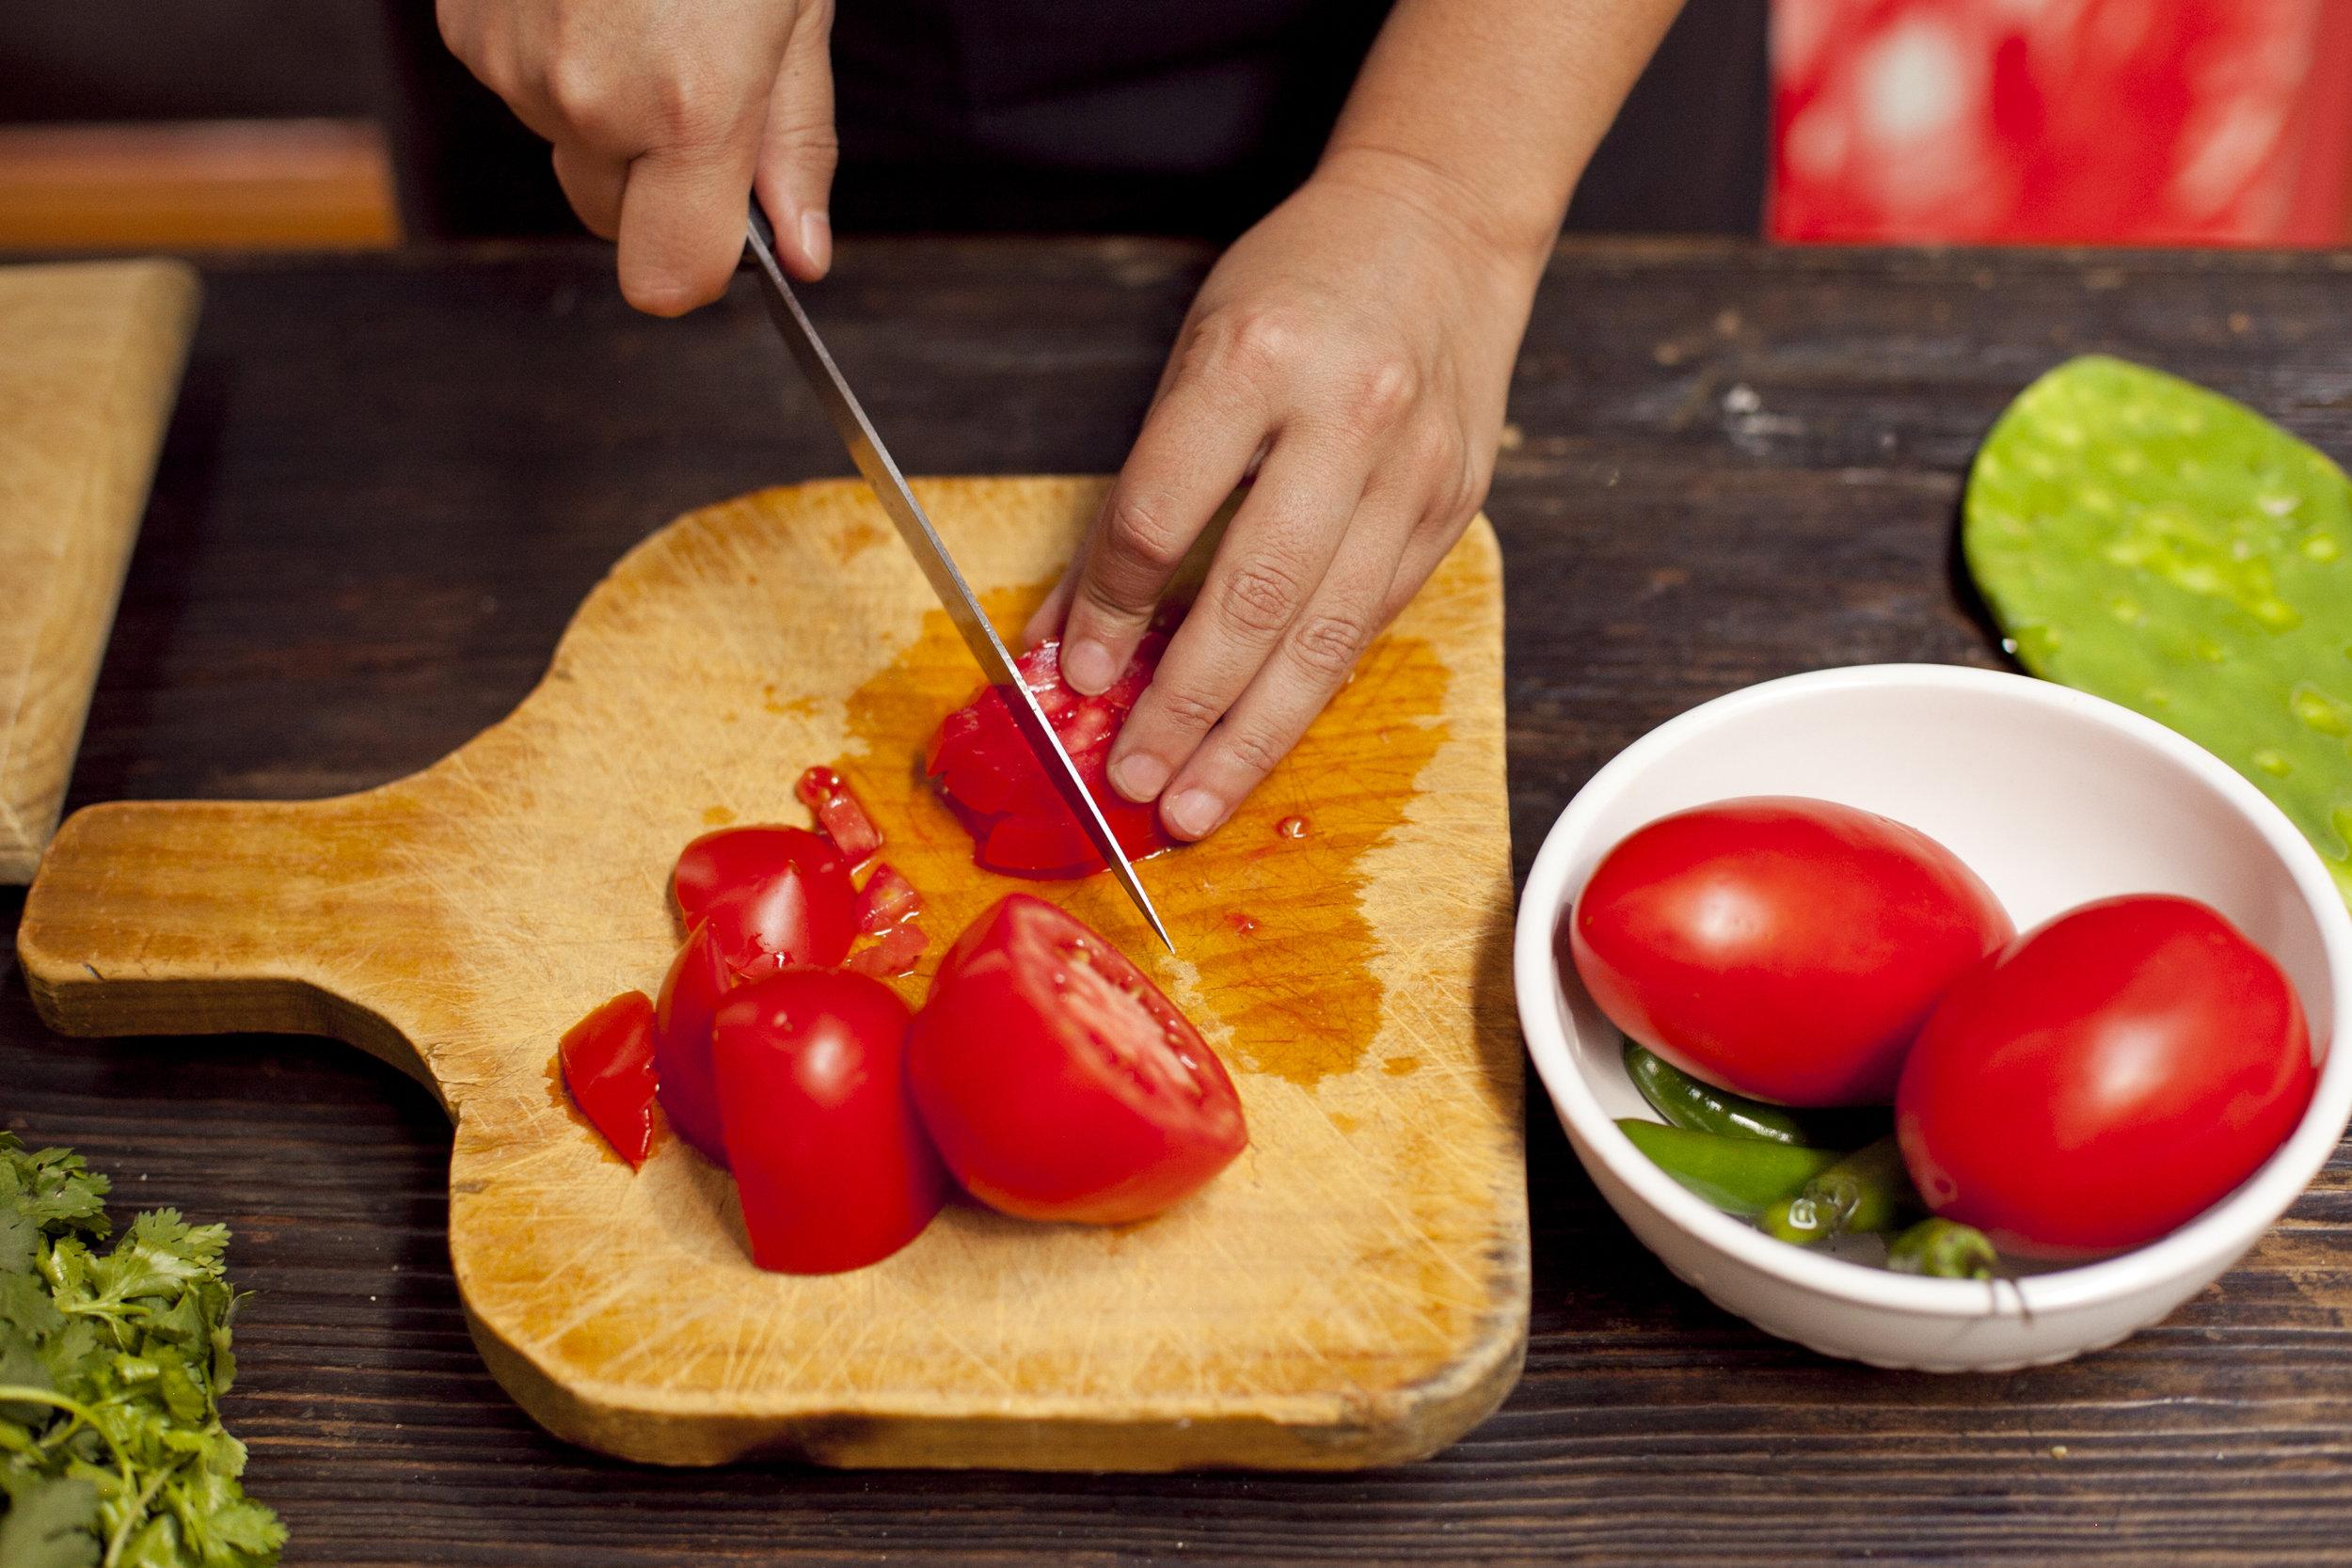 Chopping tomatoes.